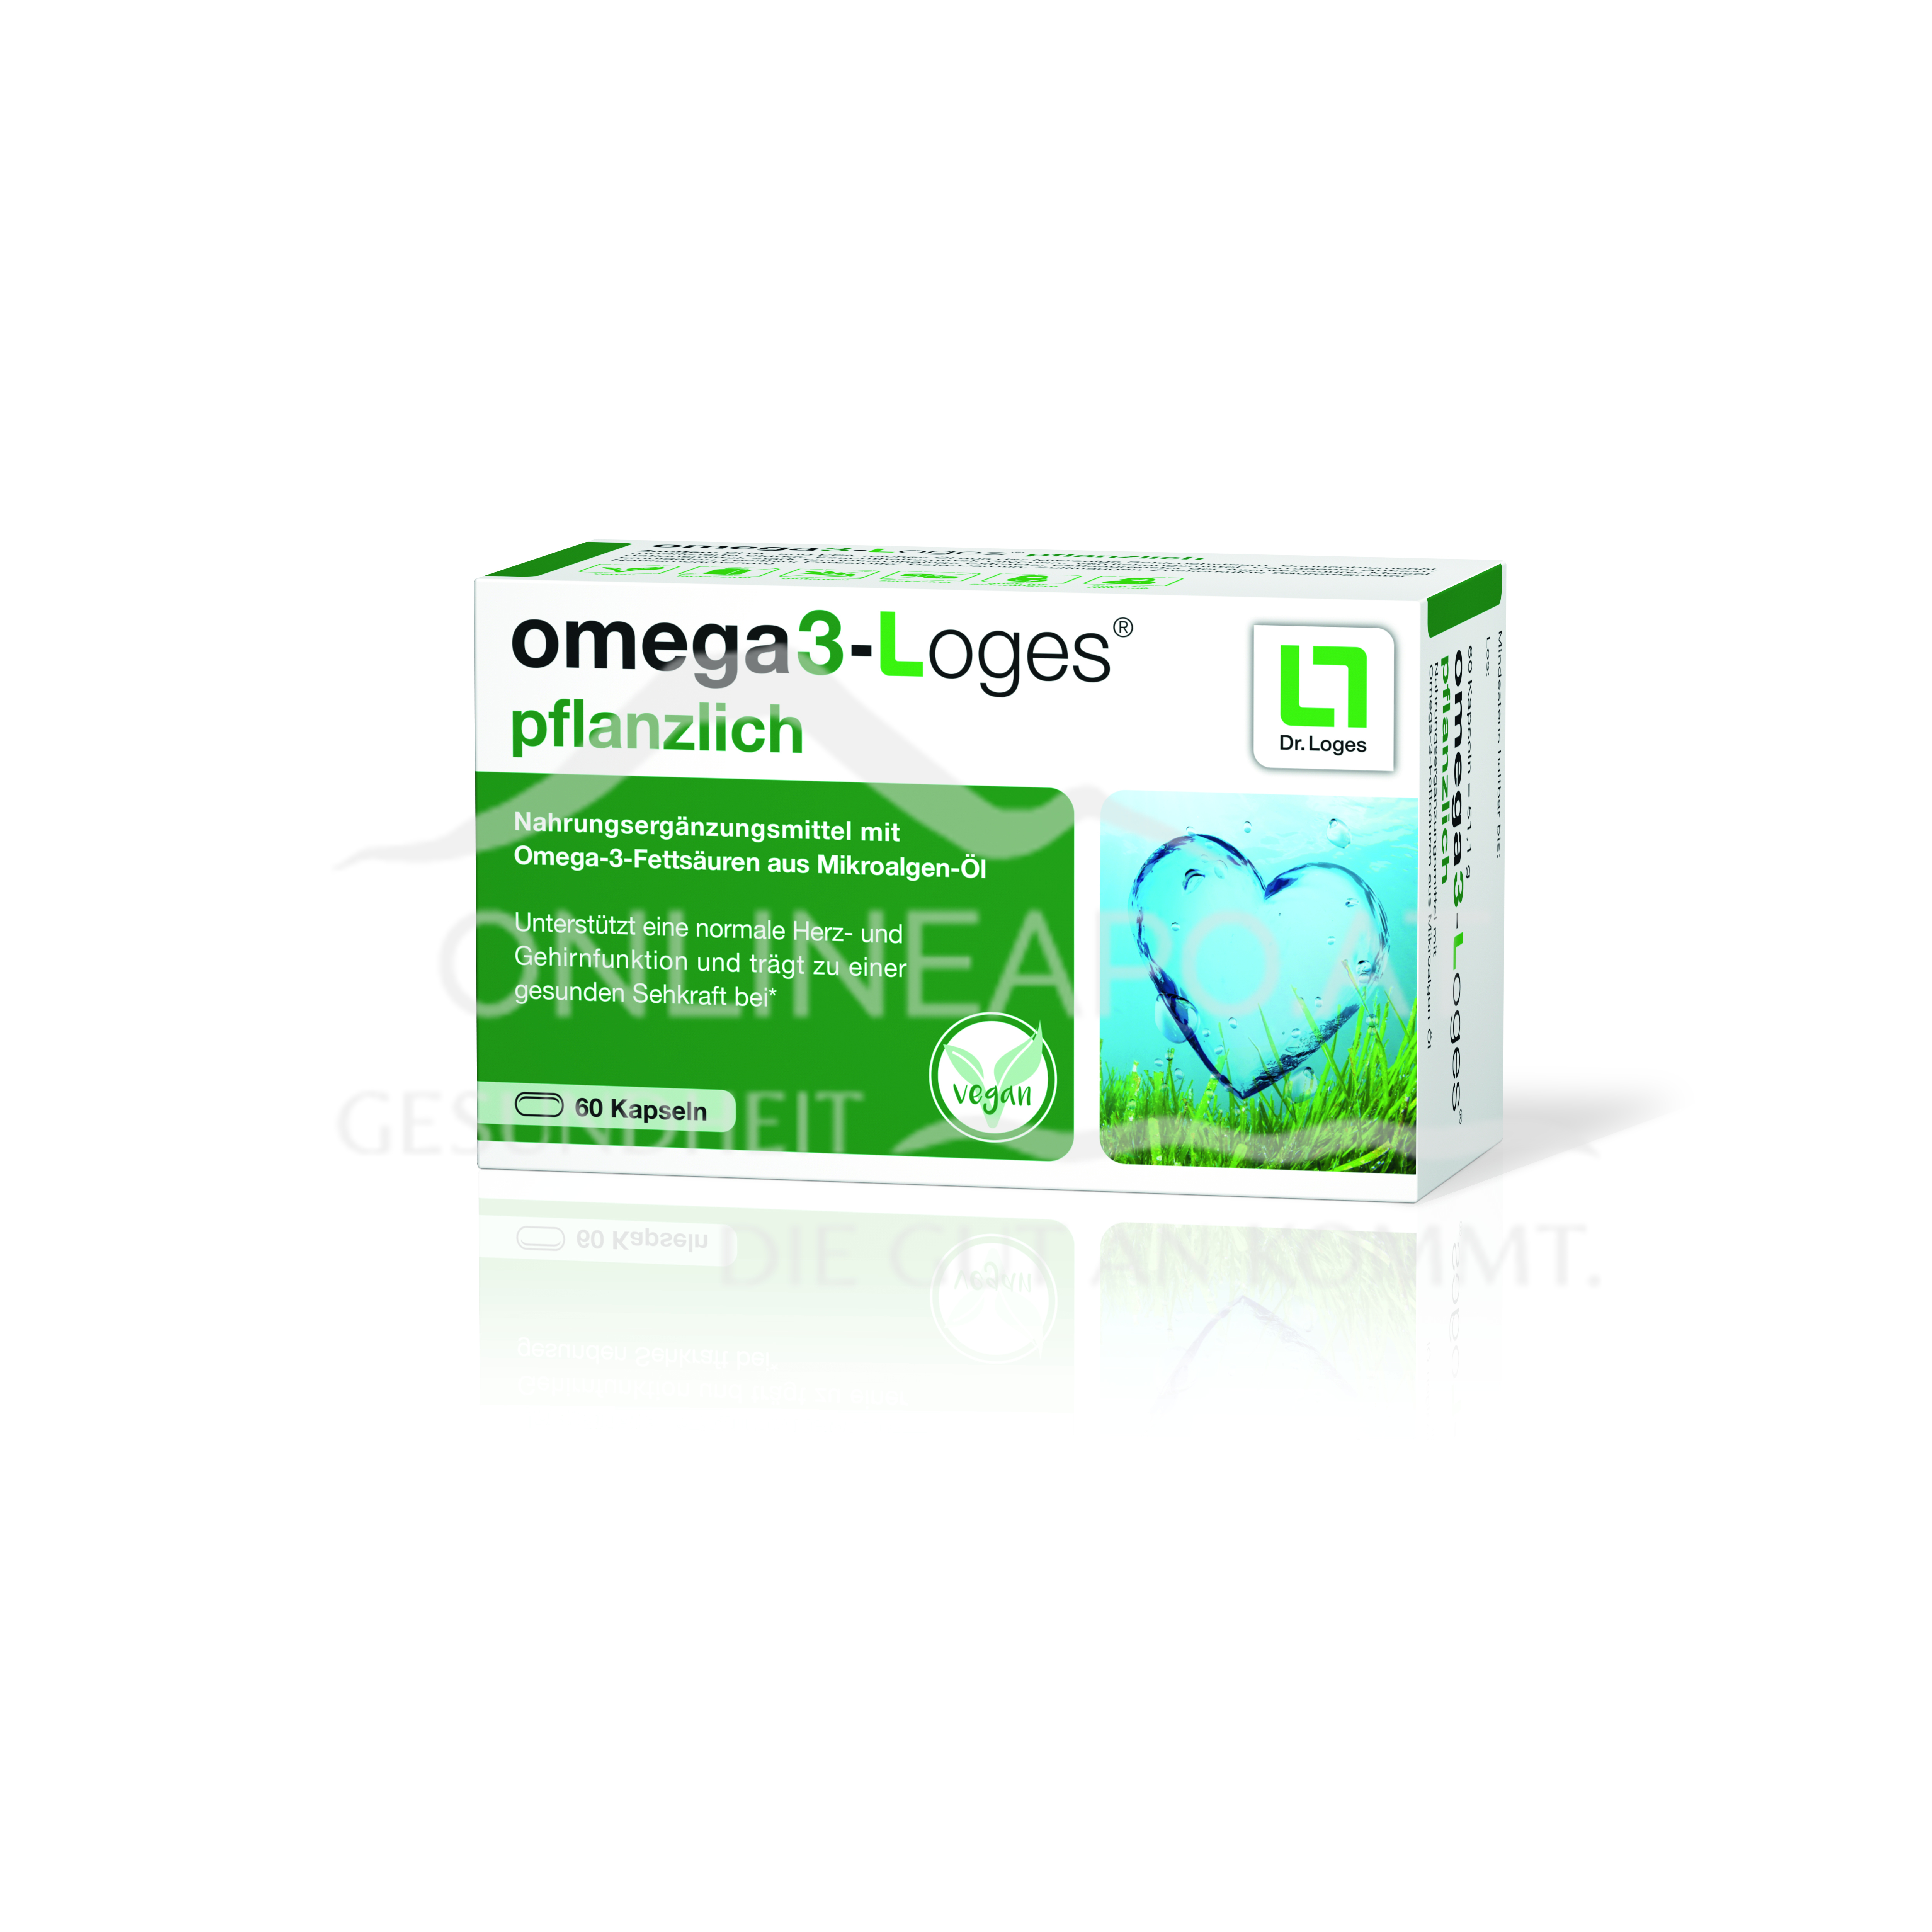 omega3-Loges® pflanzlich Kapseln